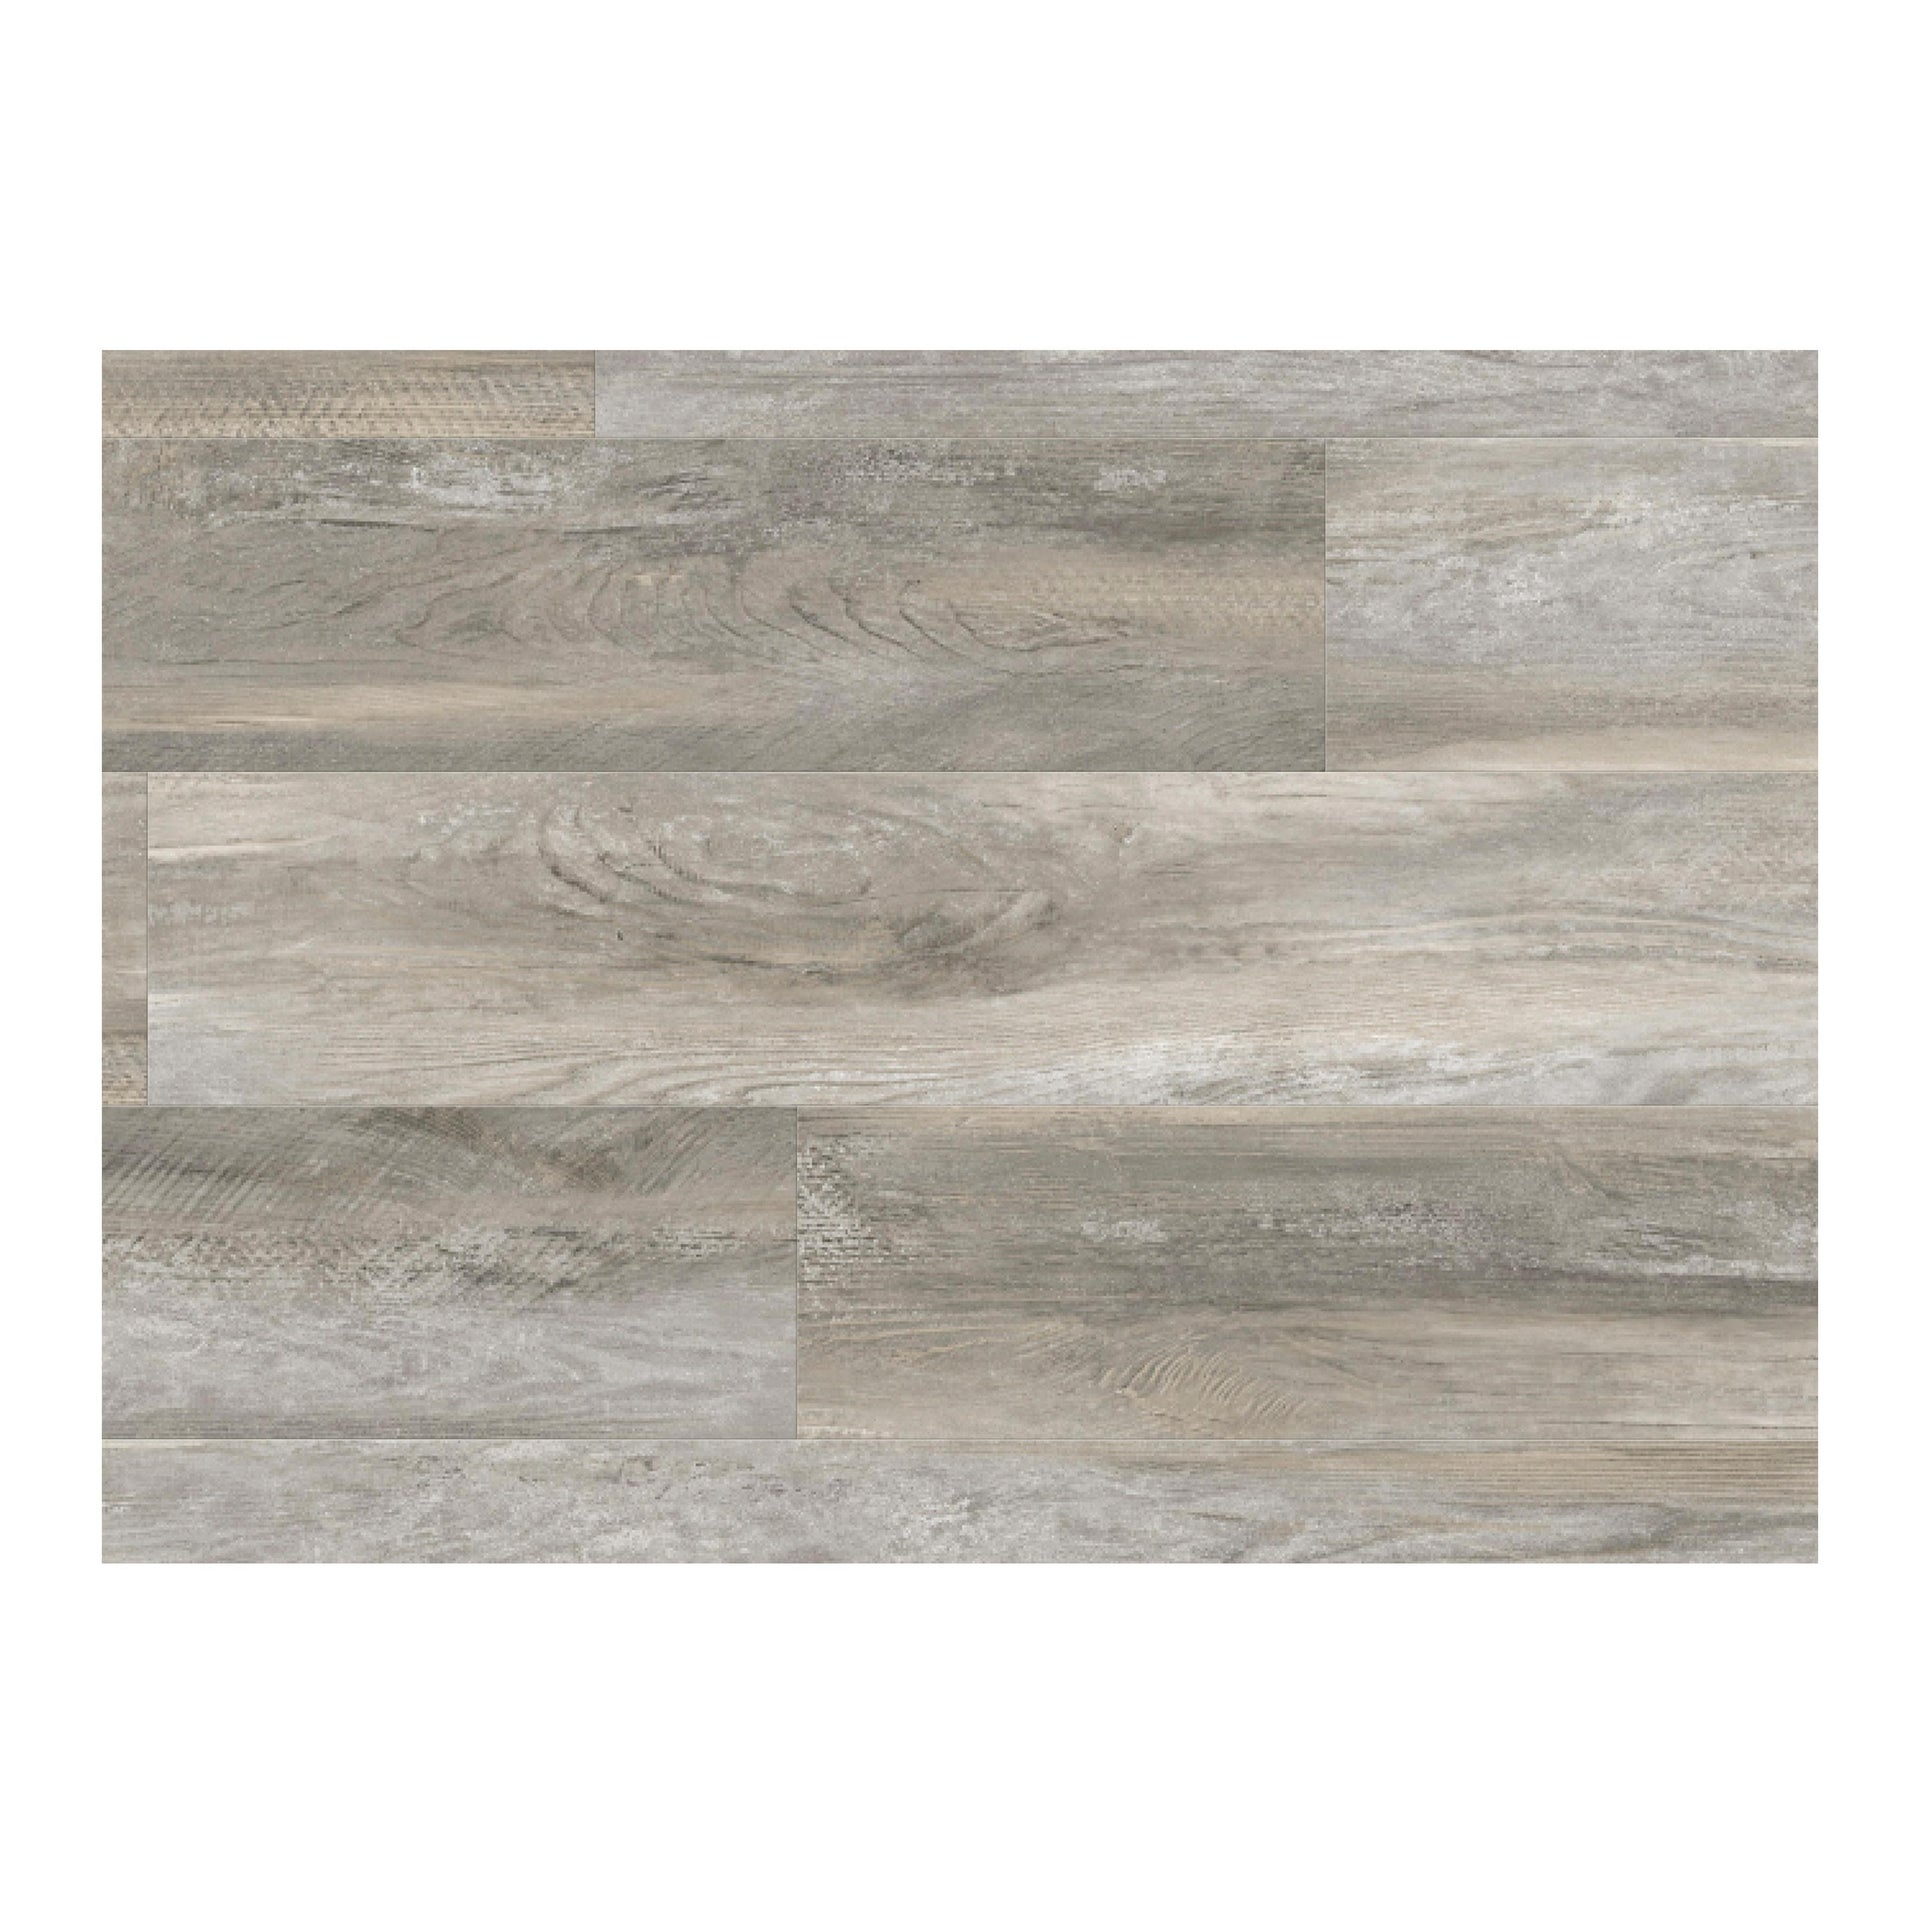 Pavimento PVC adesivo Romance Sp 2.5 mm grigio / argento - 3